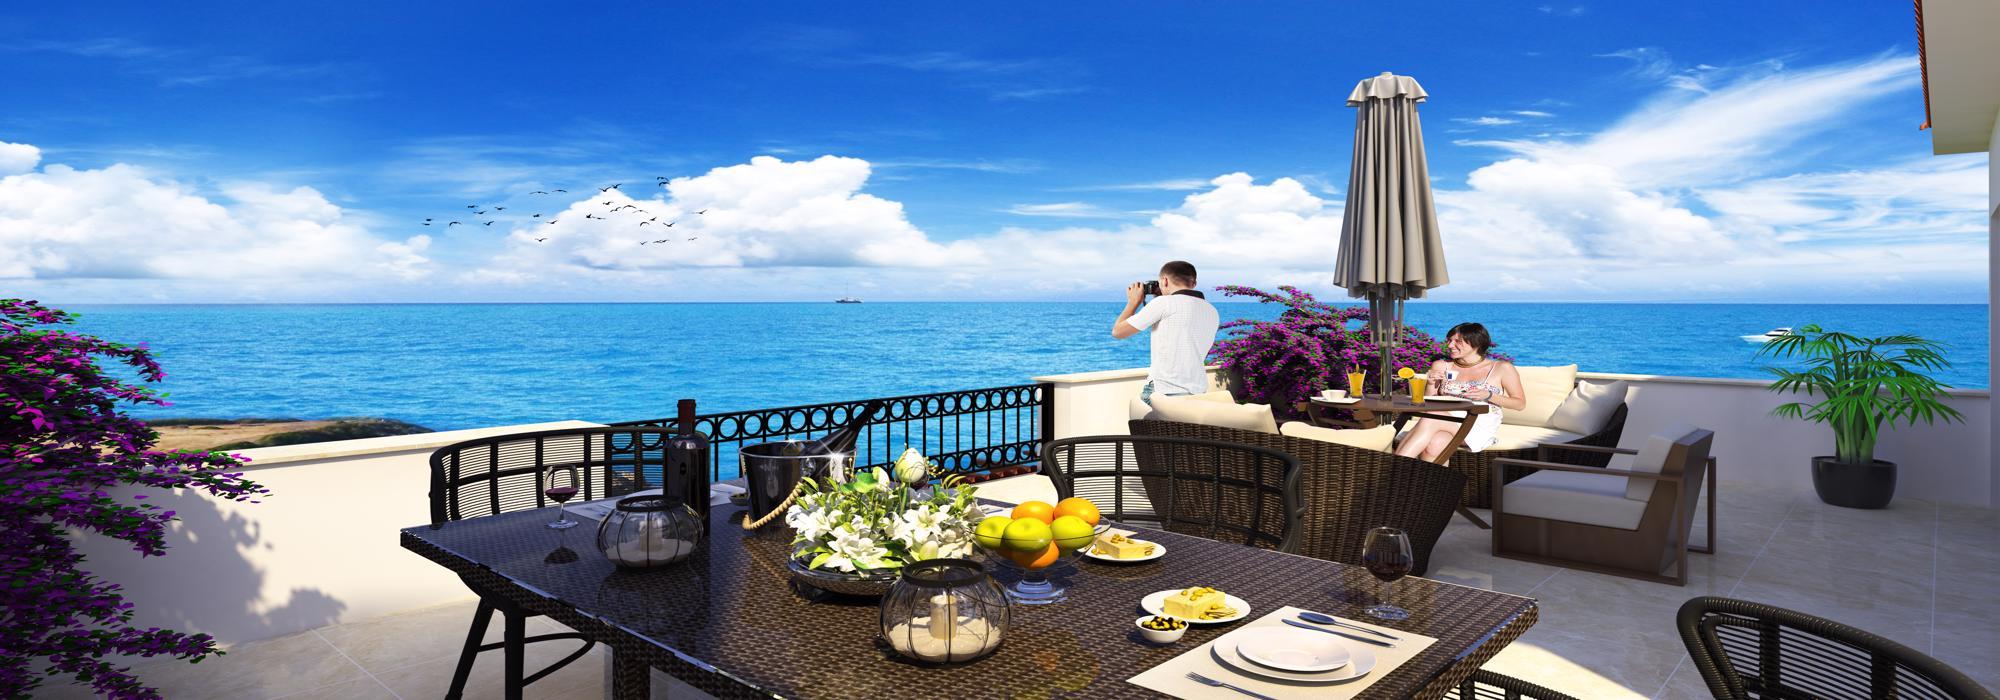 Elegant 2 Bedroom Penthouse For Sale Location Esentepe Girne North Cyprus (Sea Magic Royal)